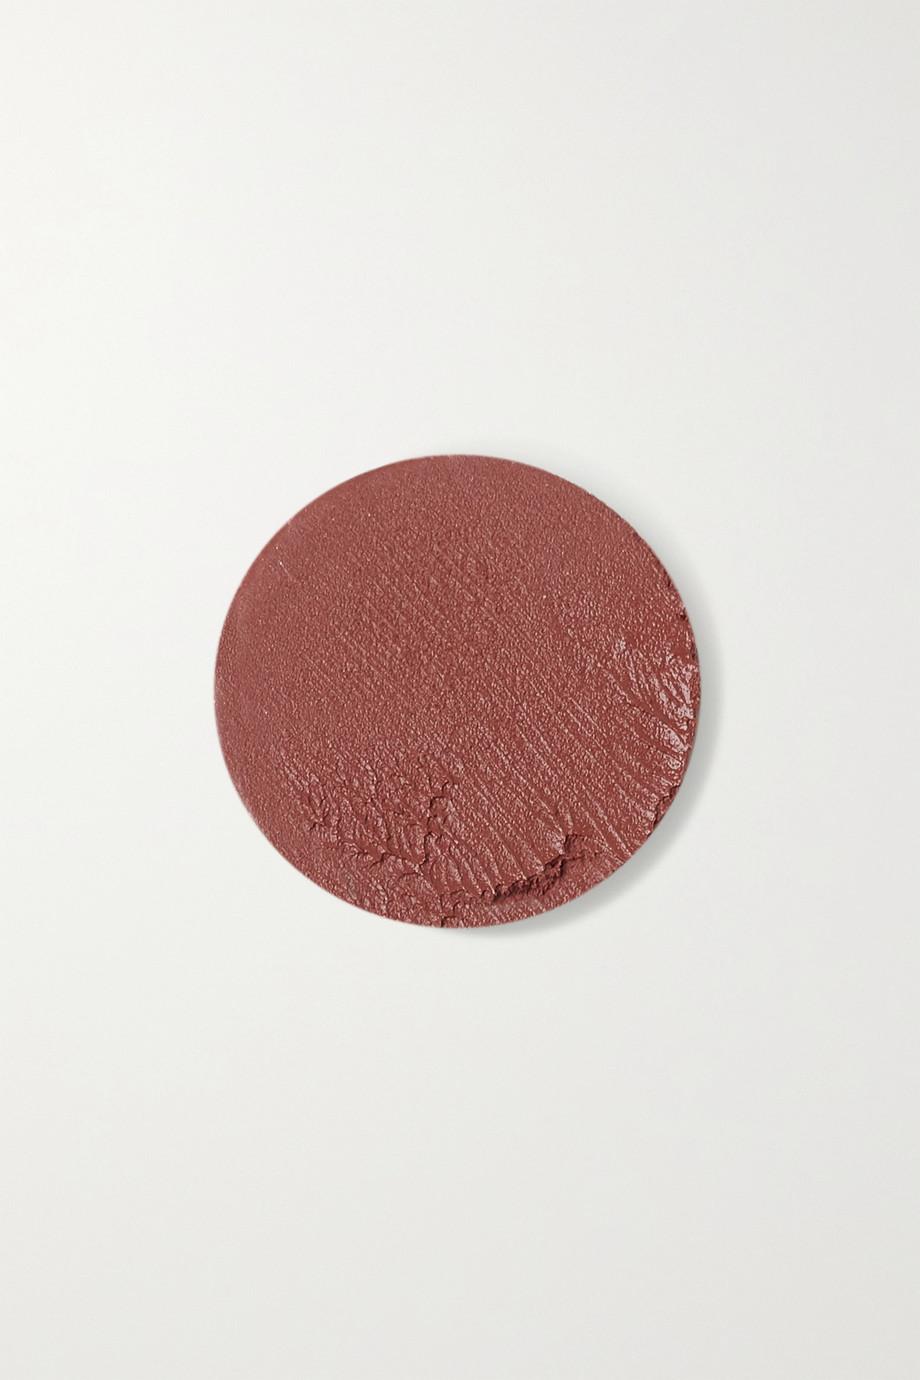 Kjaer Weis Lipstick - Ingenious